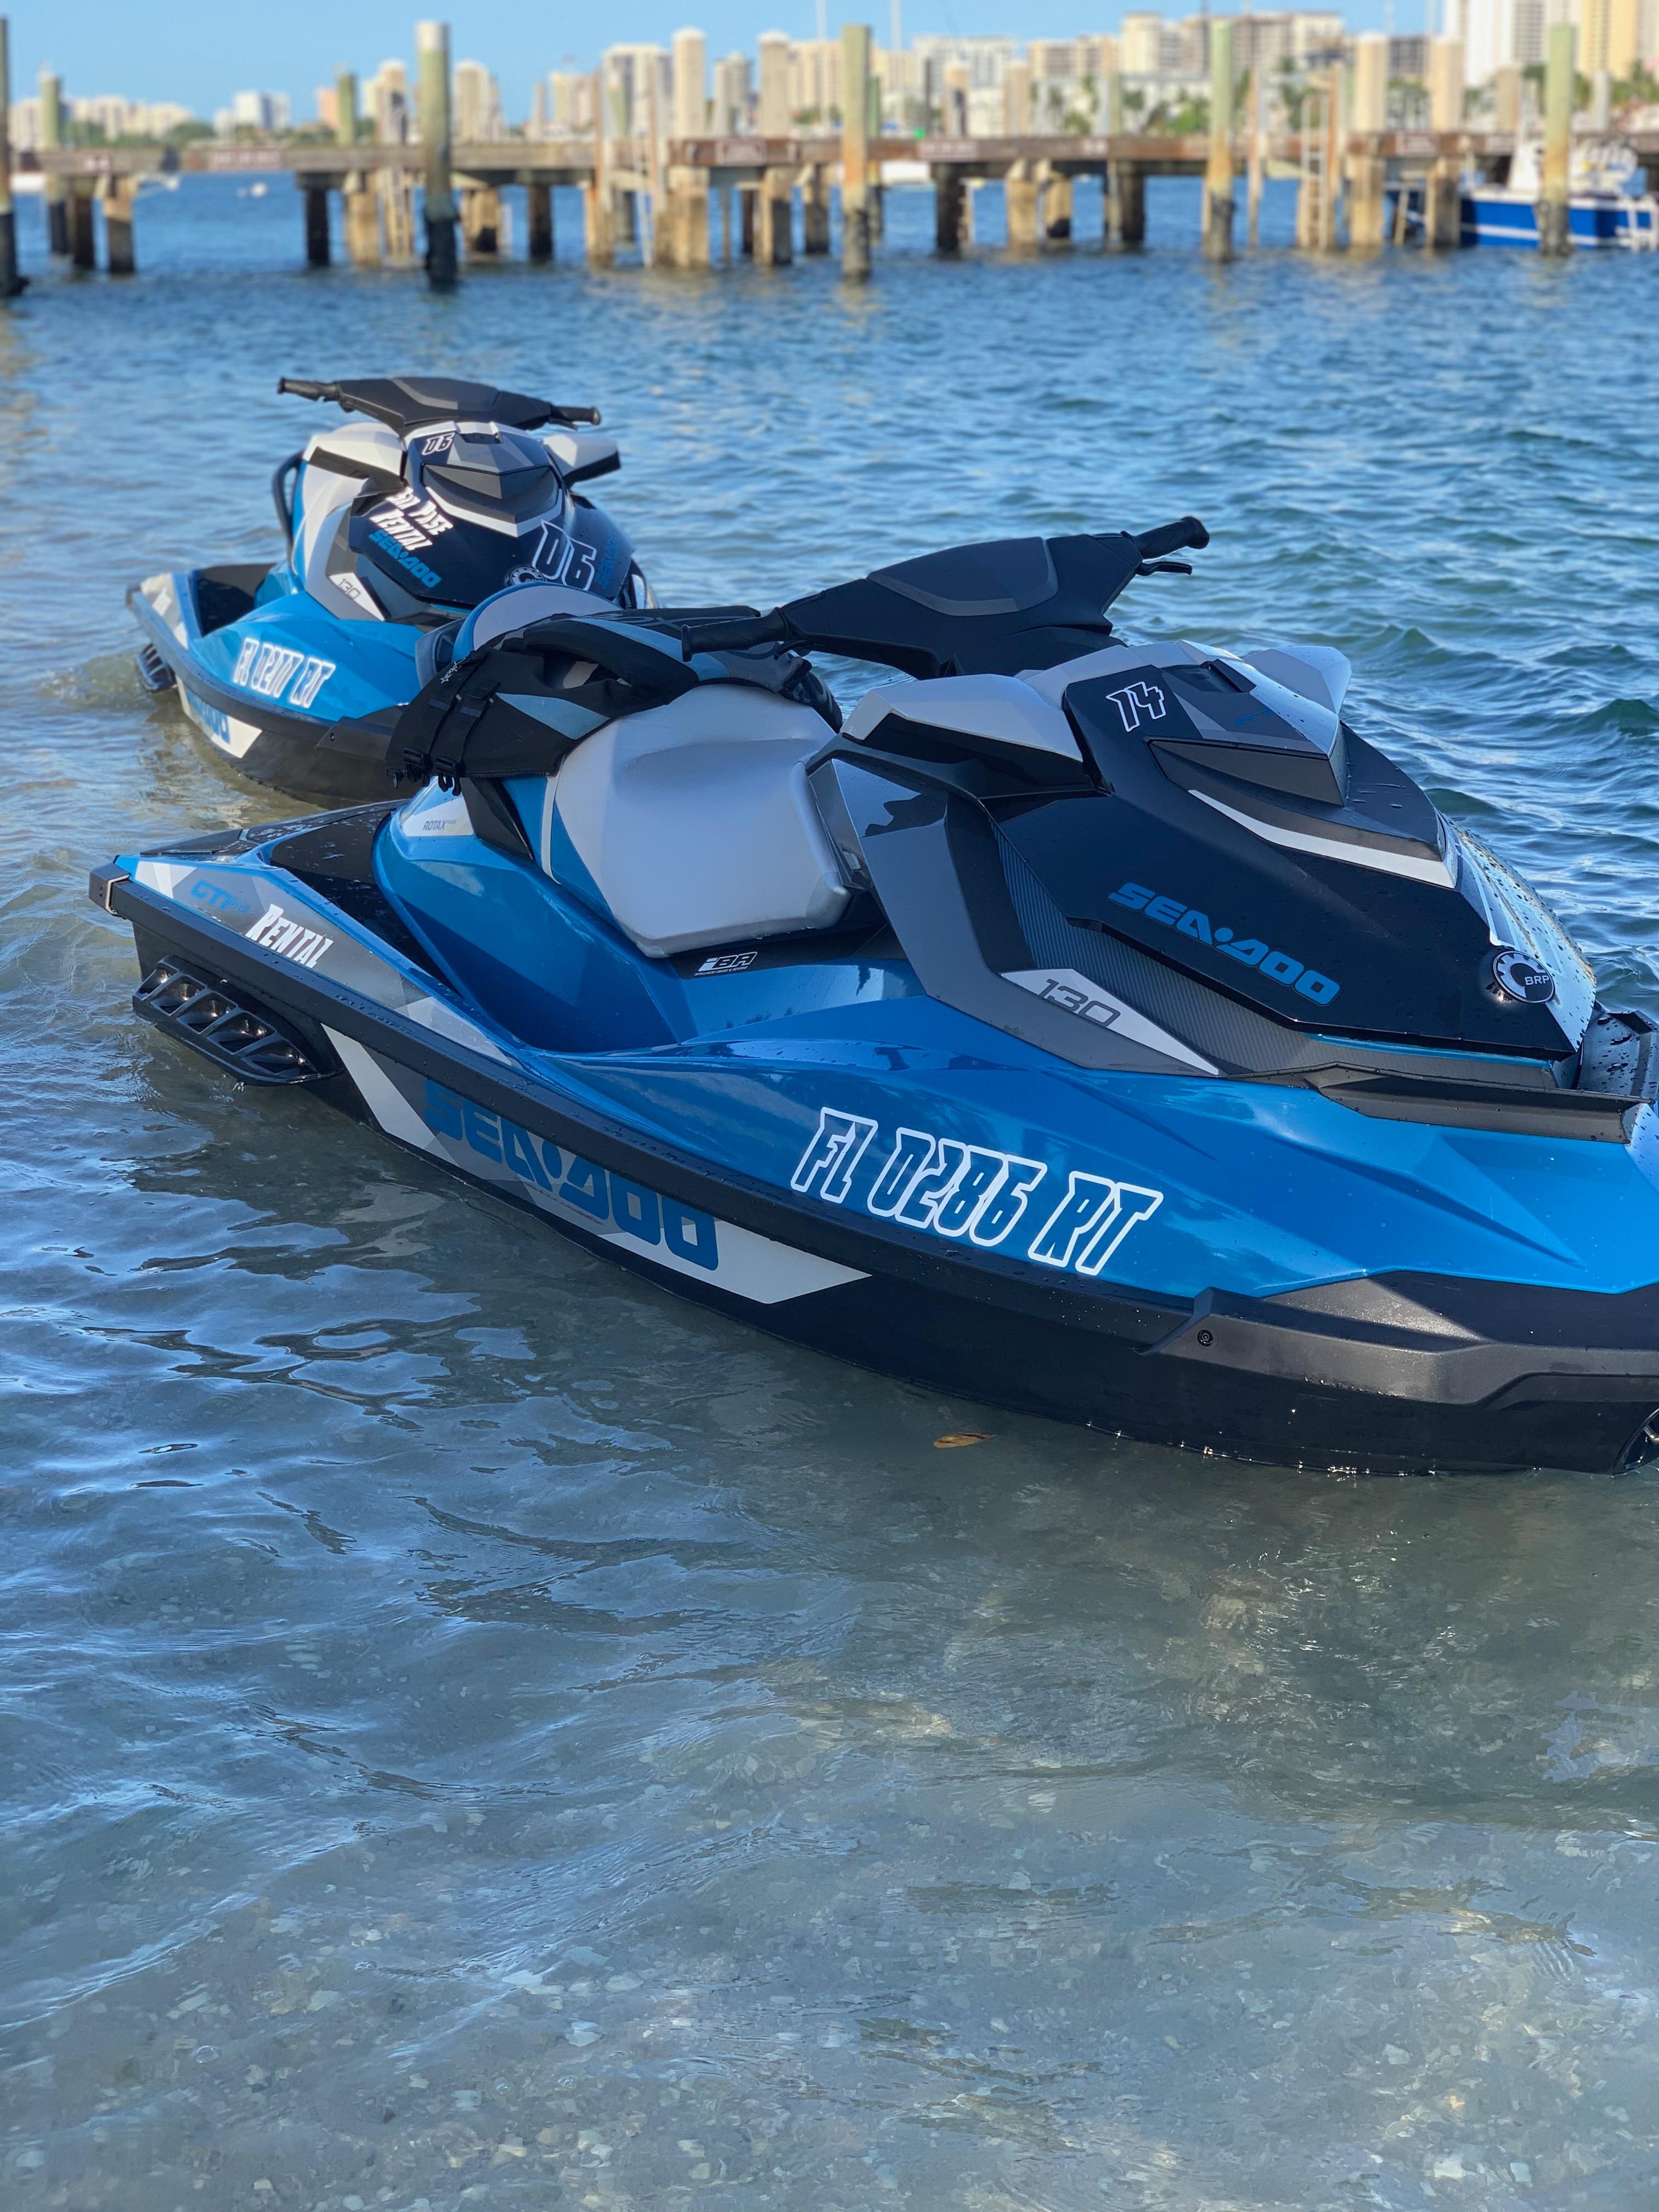 Jet ski Rental / Tour